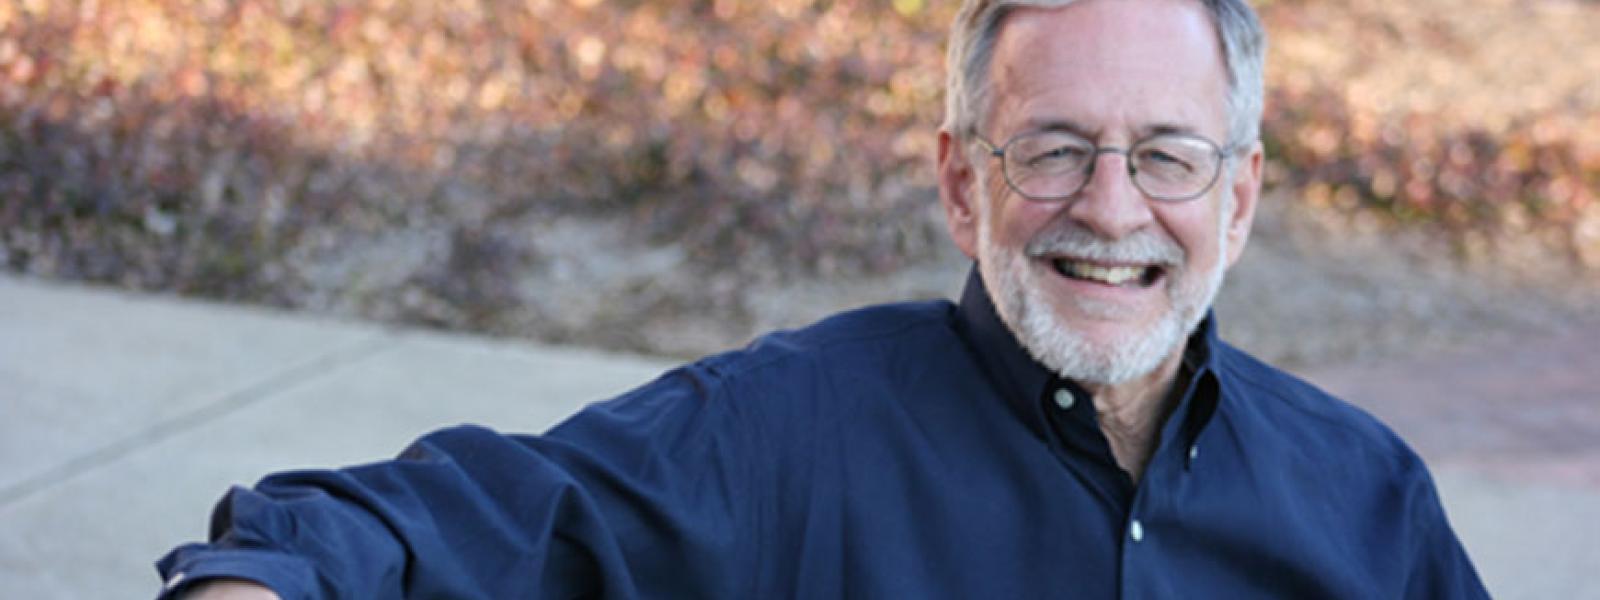 CIU's fifth president Dr. George Murray